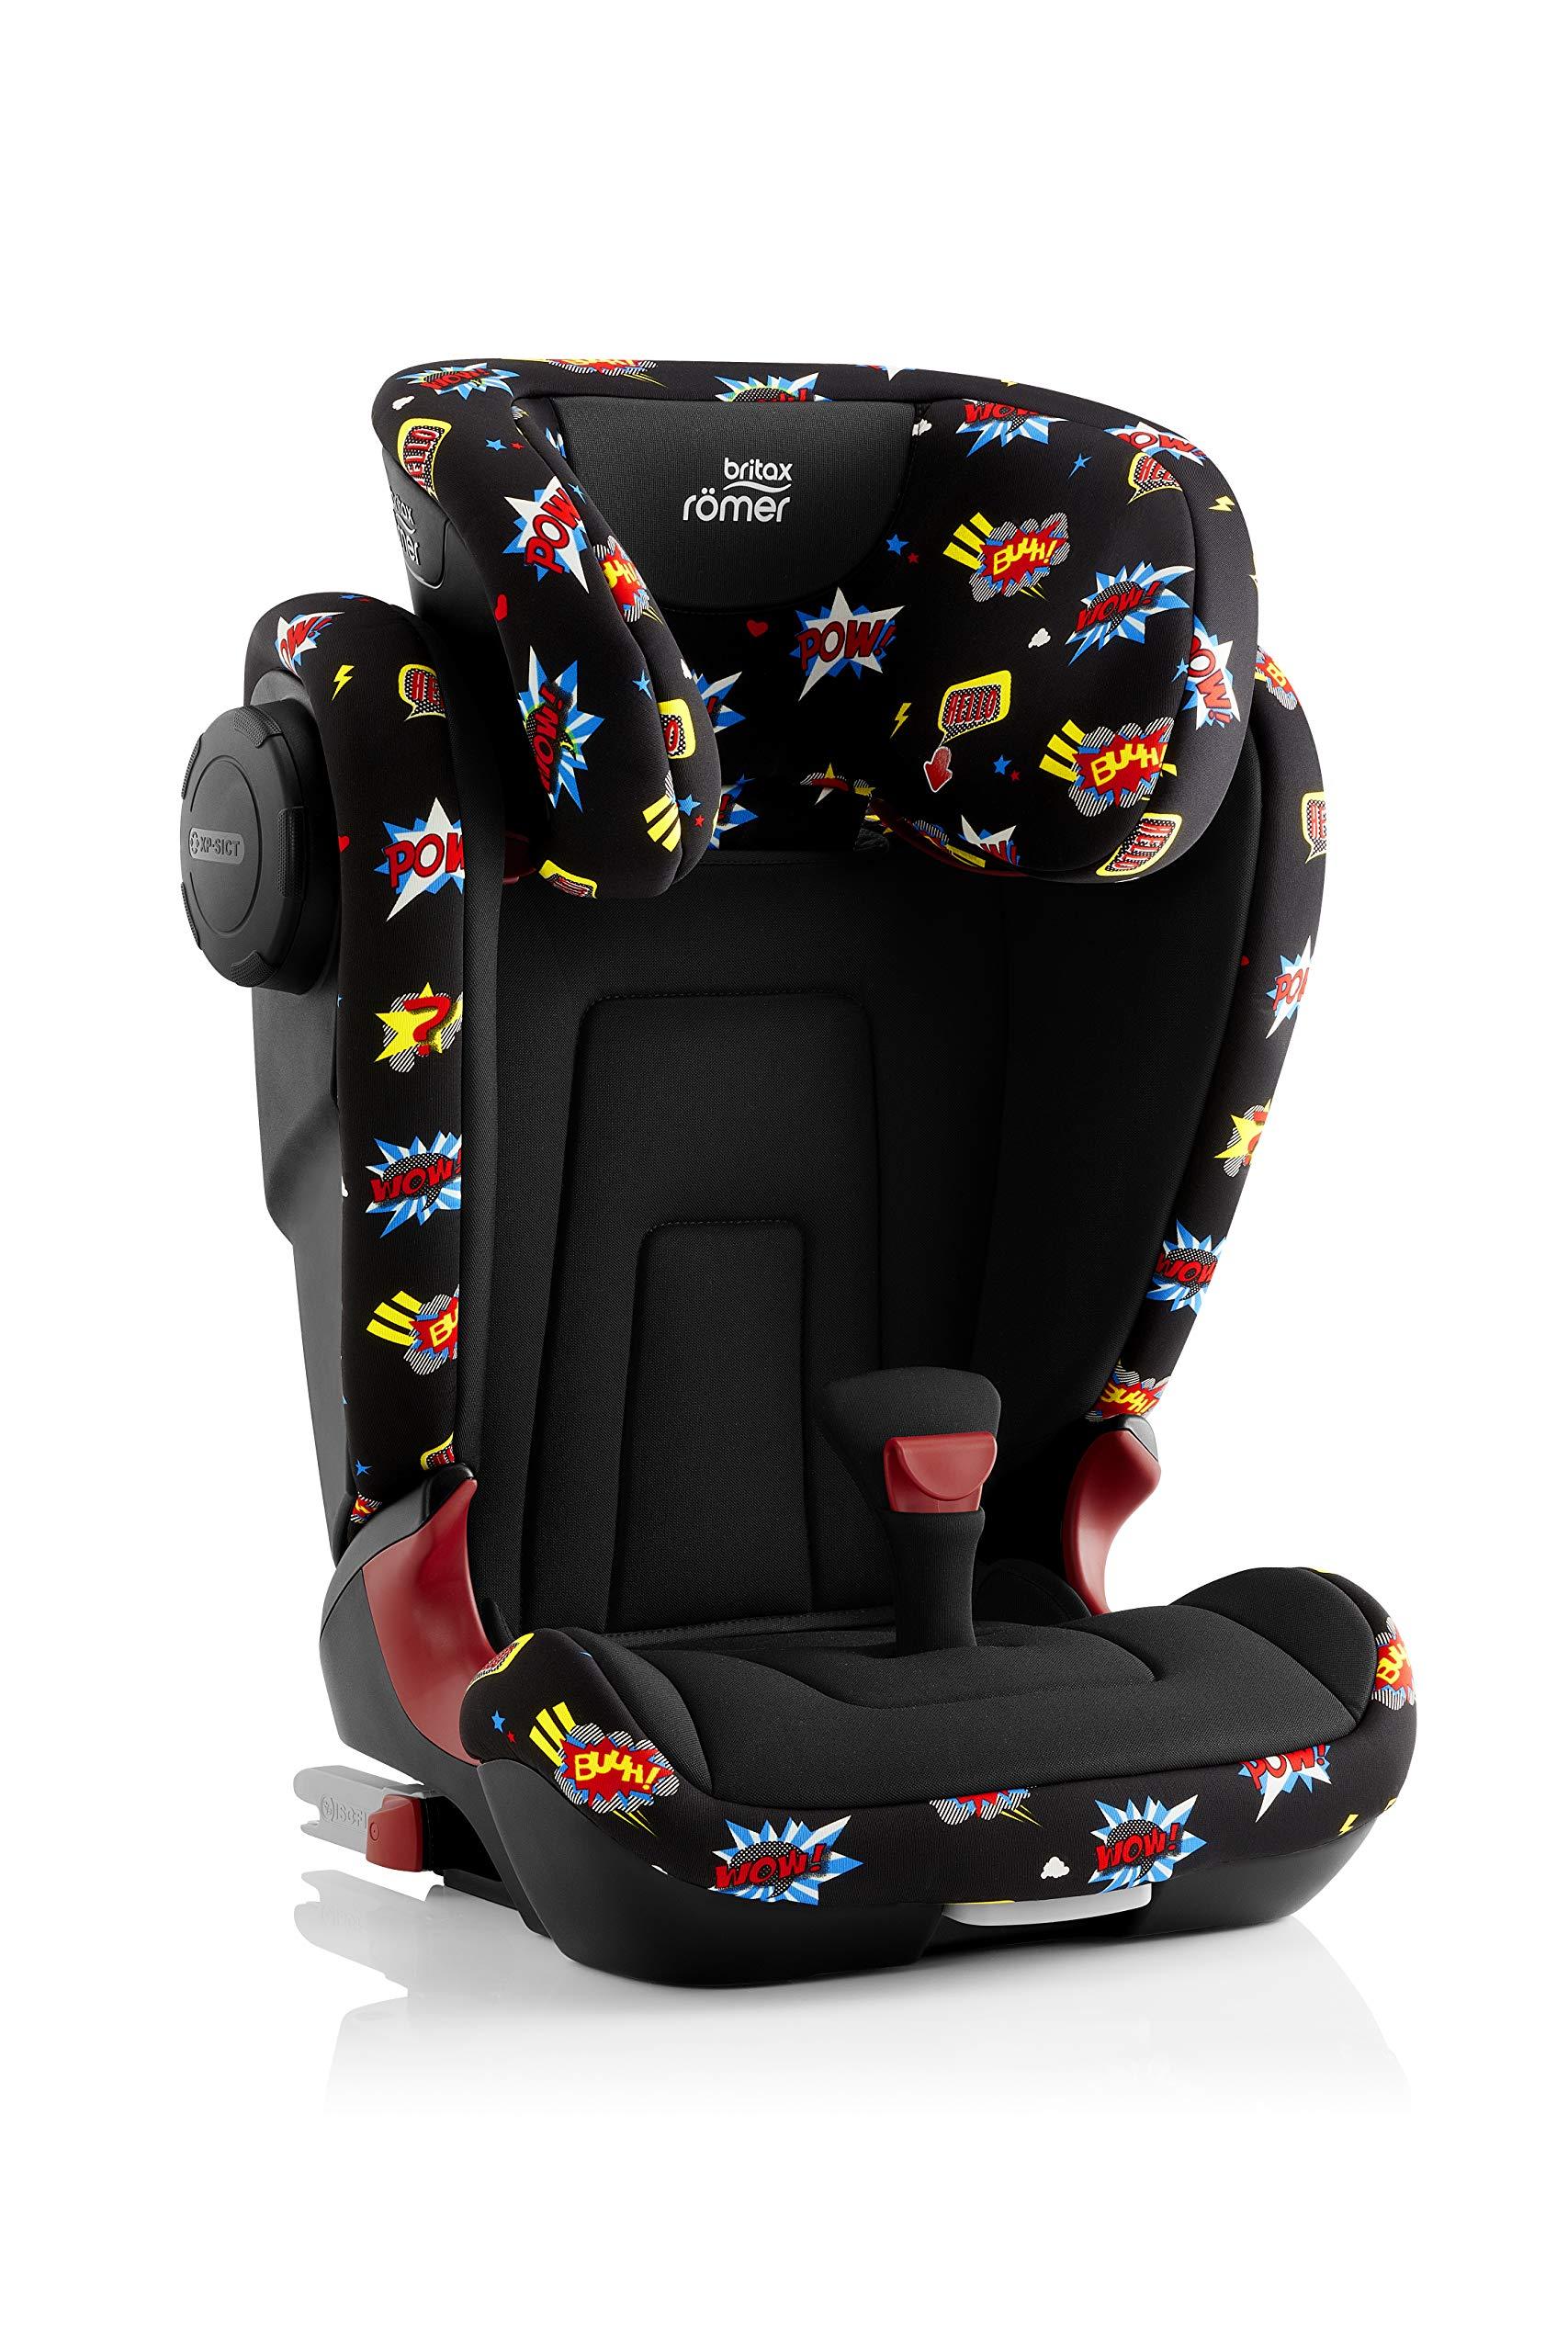 Britax Römer KIDFIX² S Group 2-3 (15-36kg) Car Seat - Comic Fun  Britax Excelsior Ltd (First Order Account)